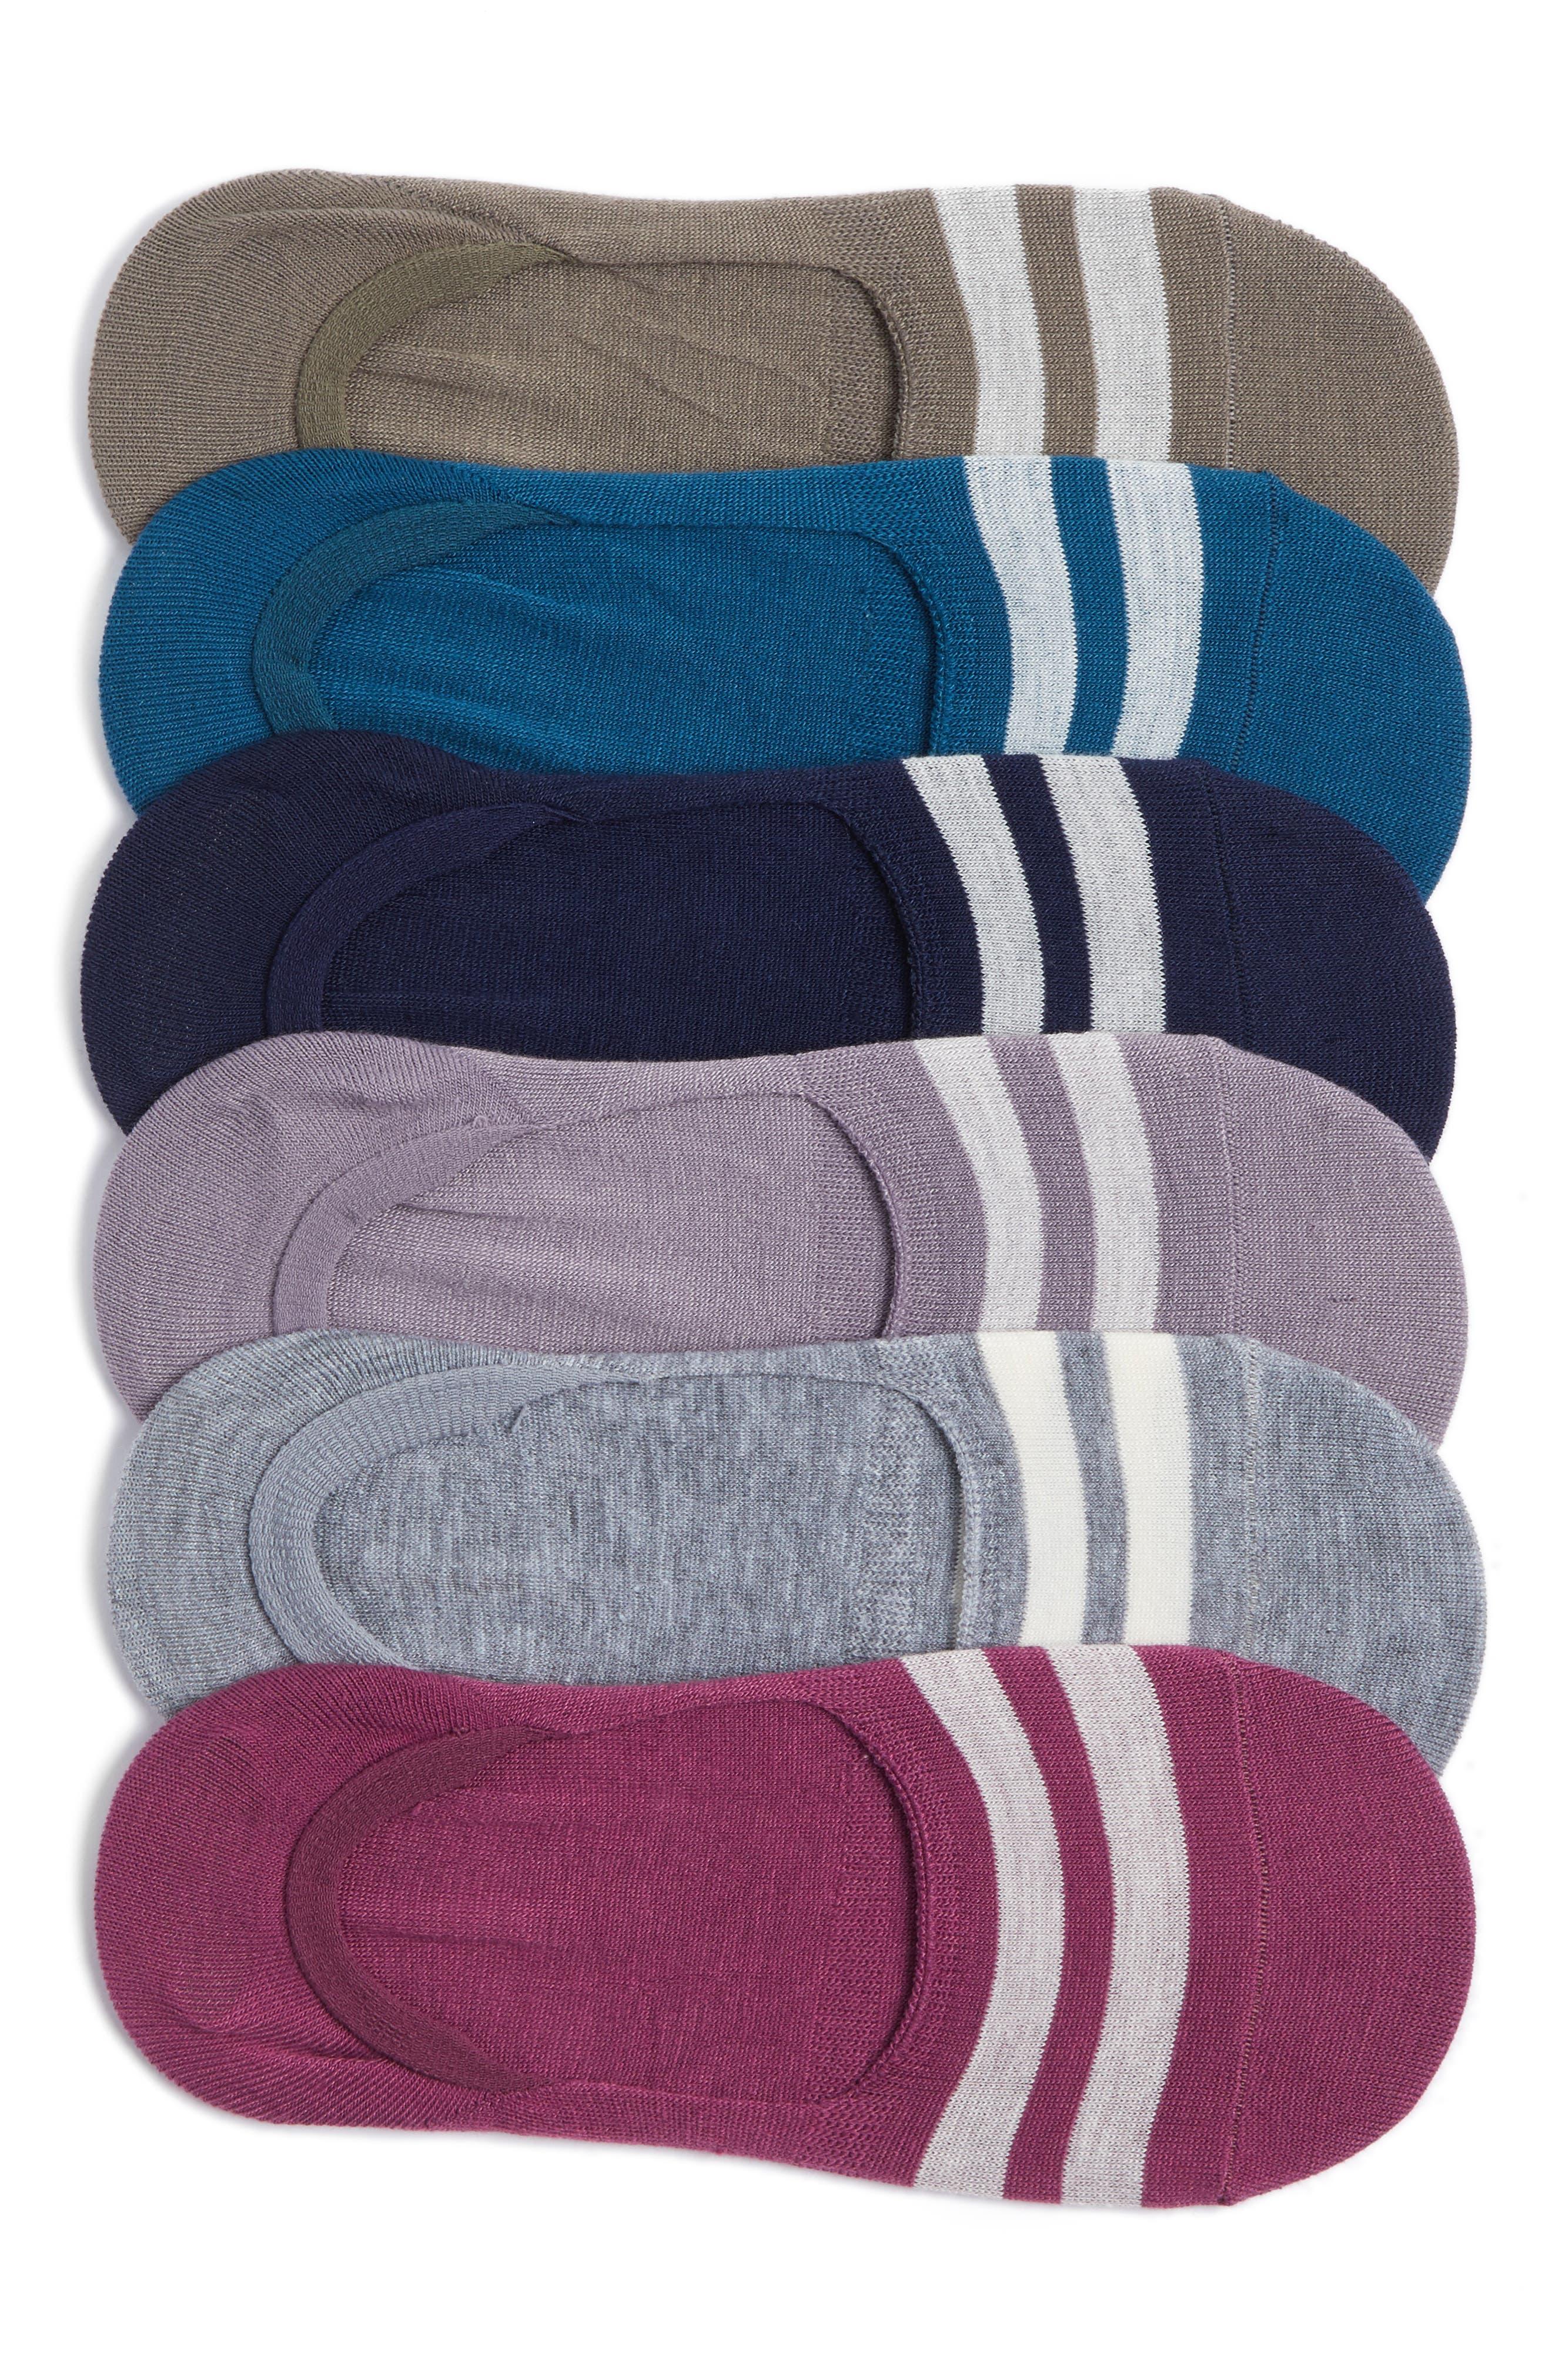 Varsity Stripe No-Show Socks,                             Main thumbnail 1, color,                             Grey Assorted